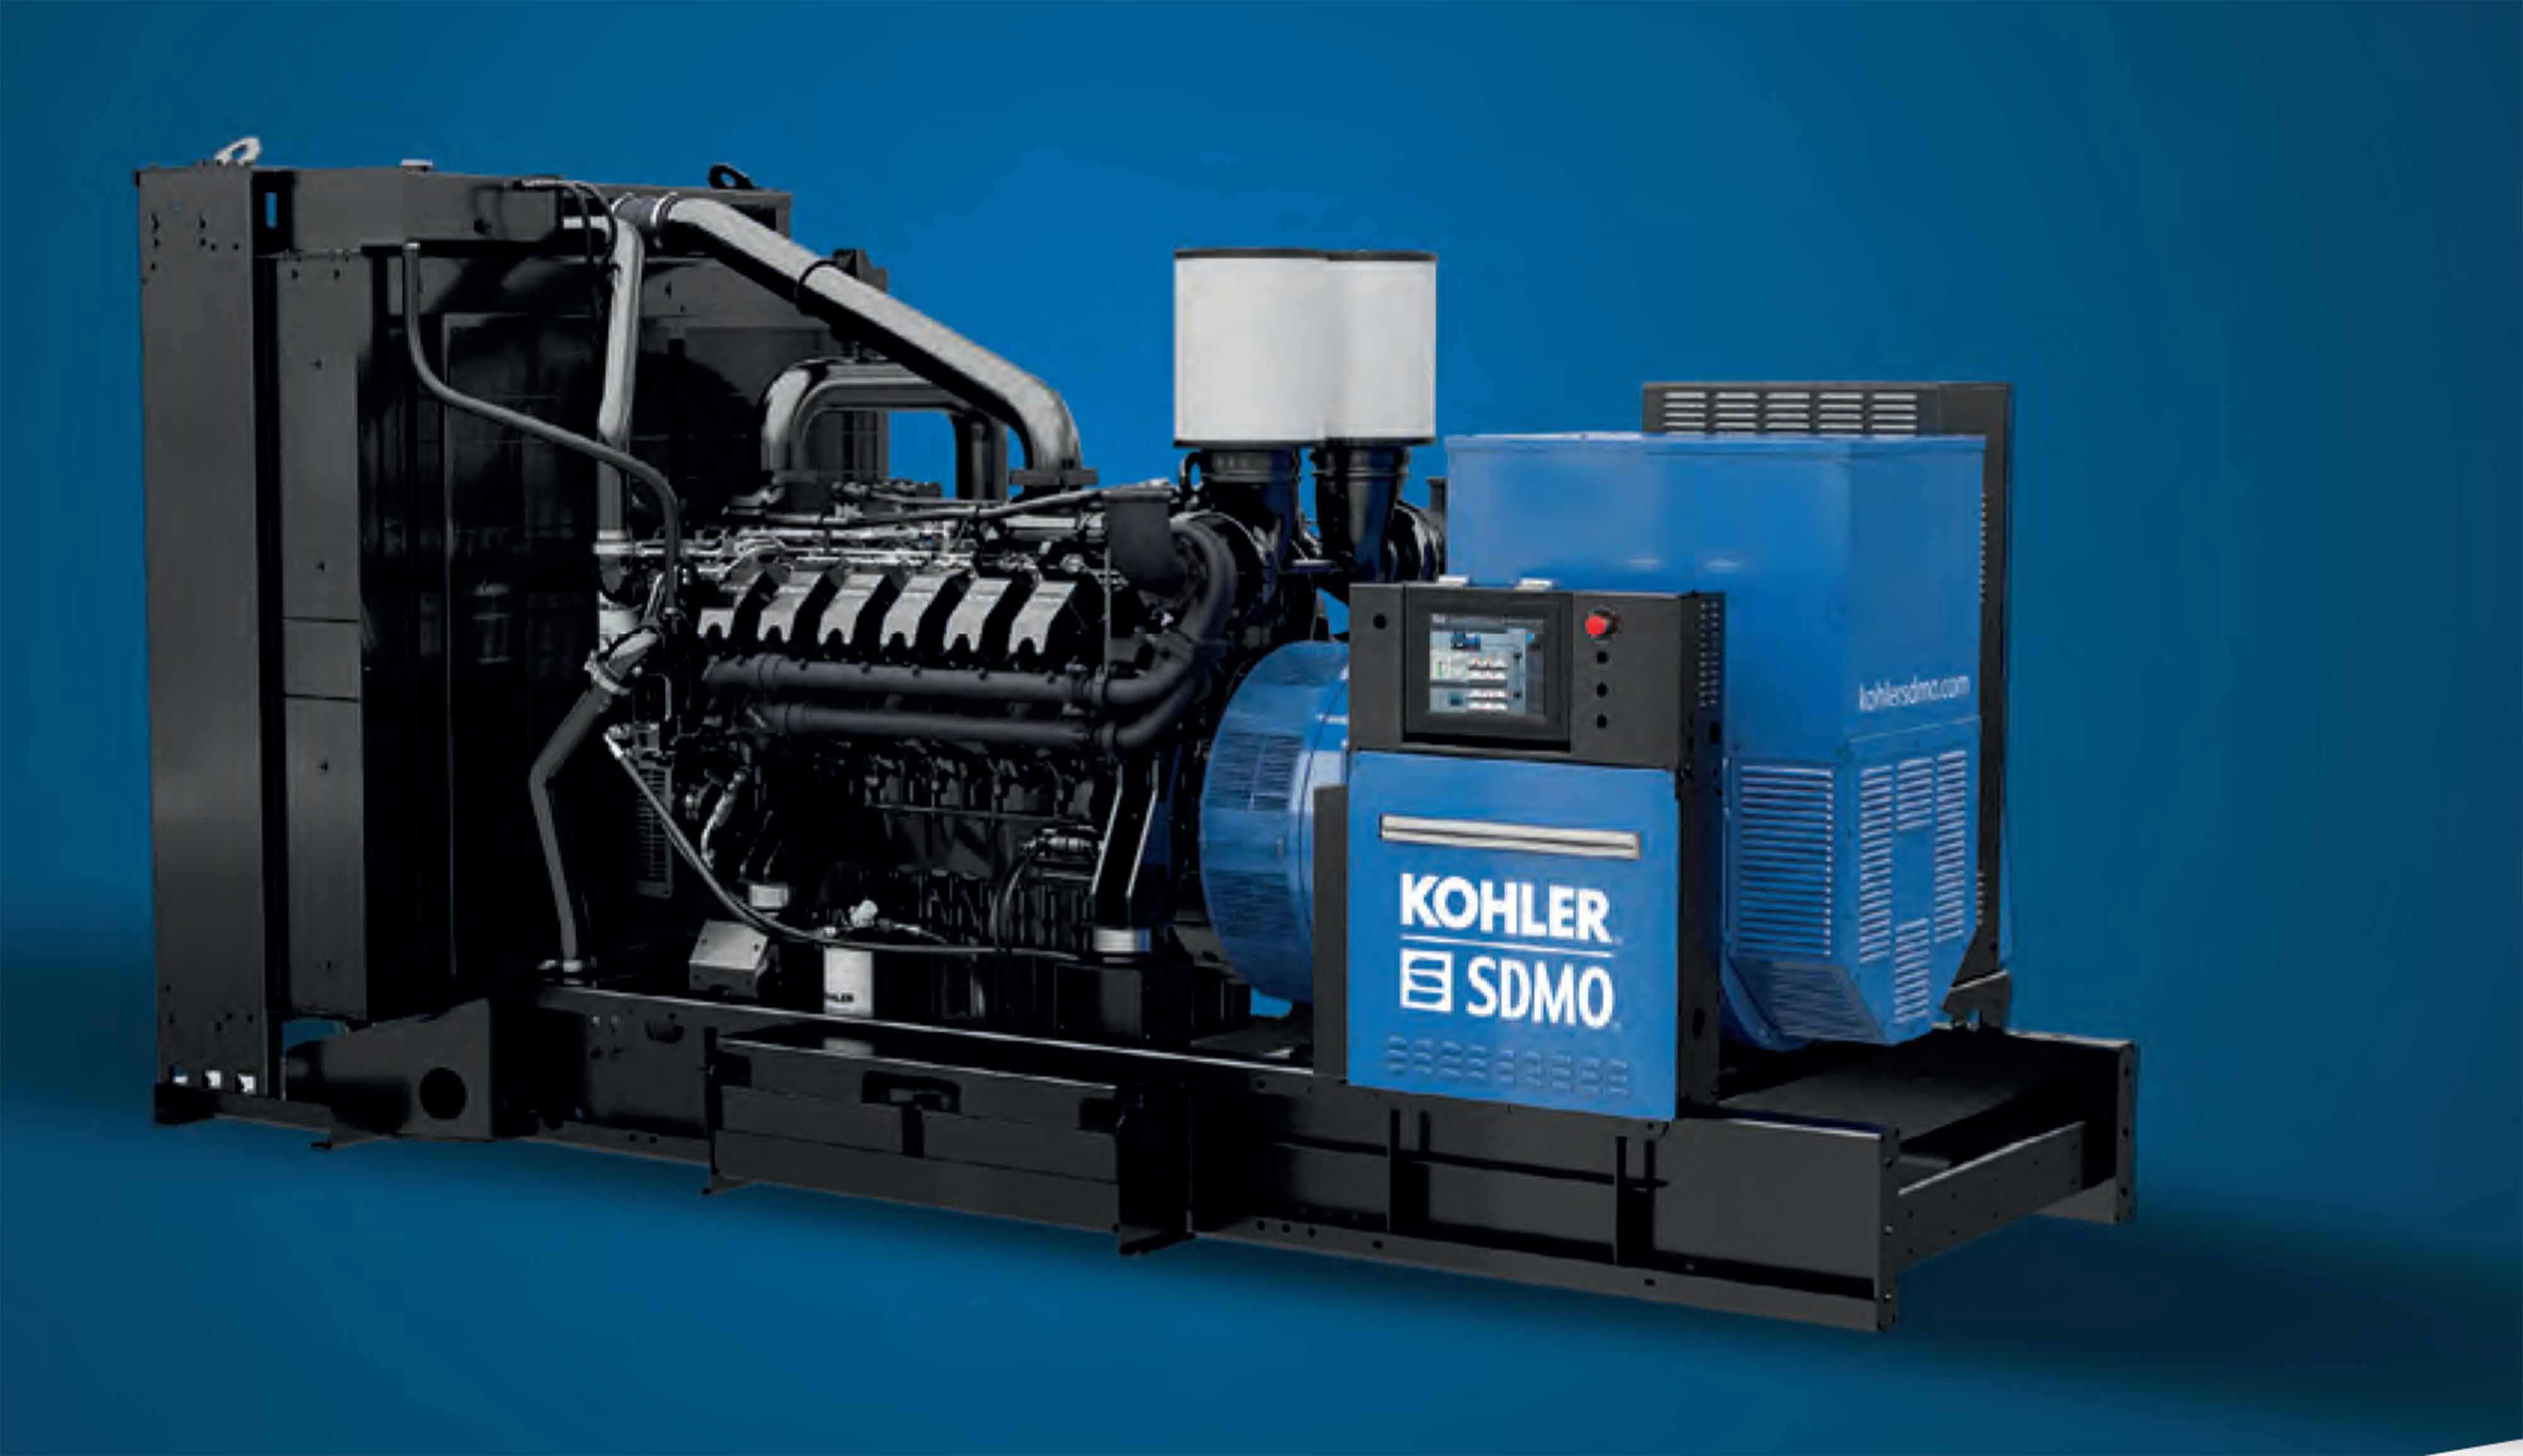 KOHLER-SDMO NEW GENERATION KOHLER ENGINES DEDICATED TO HIGH POWER ...